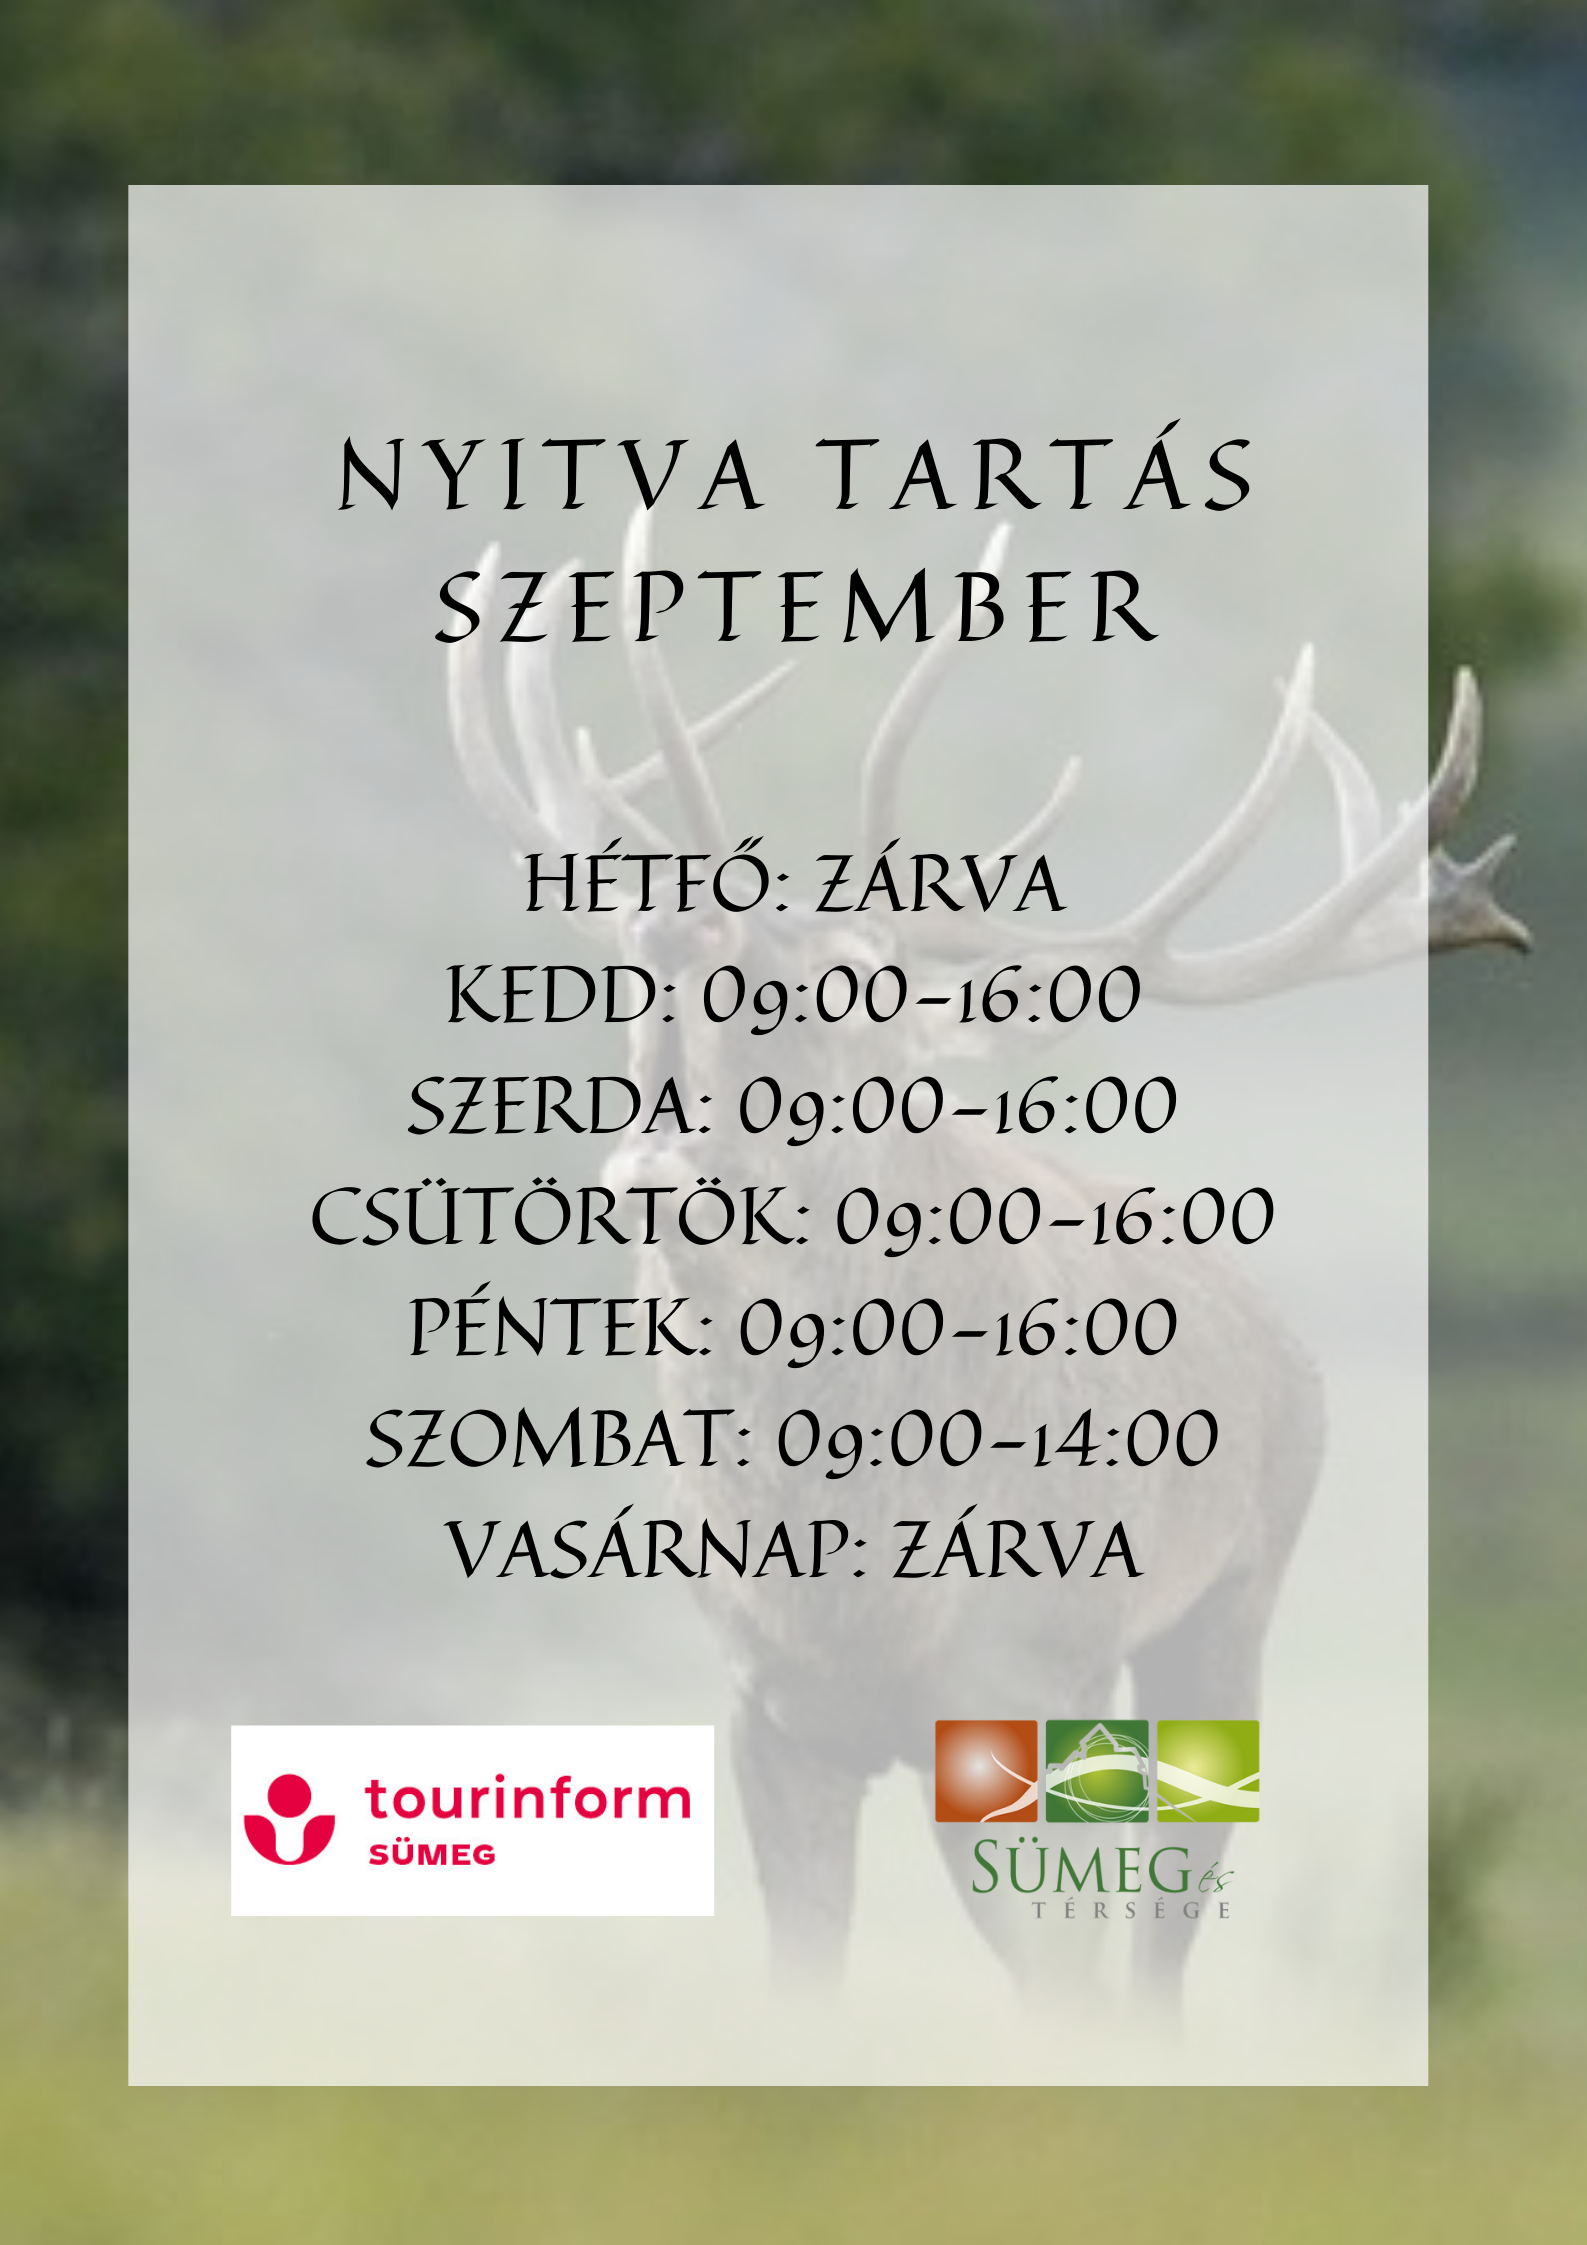 Sümeg Tourinform Iroda Szeptemberi nyitva tartása